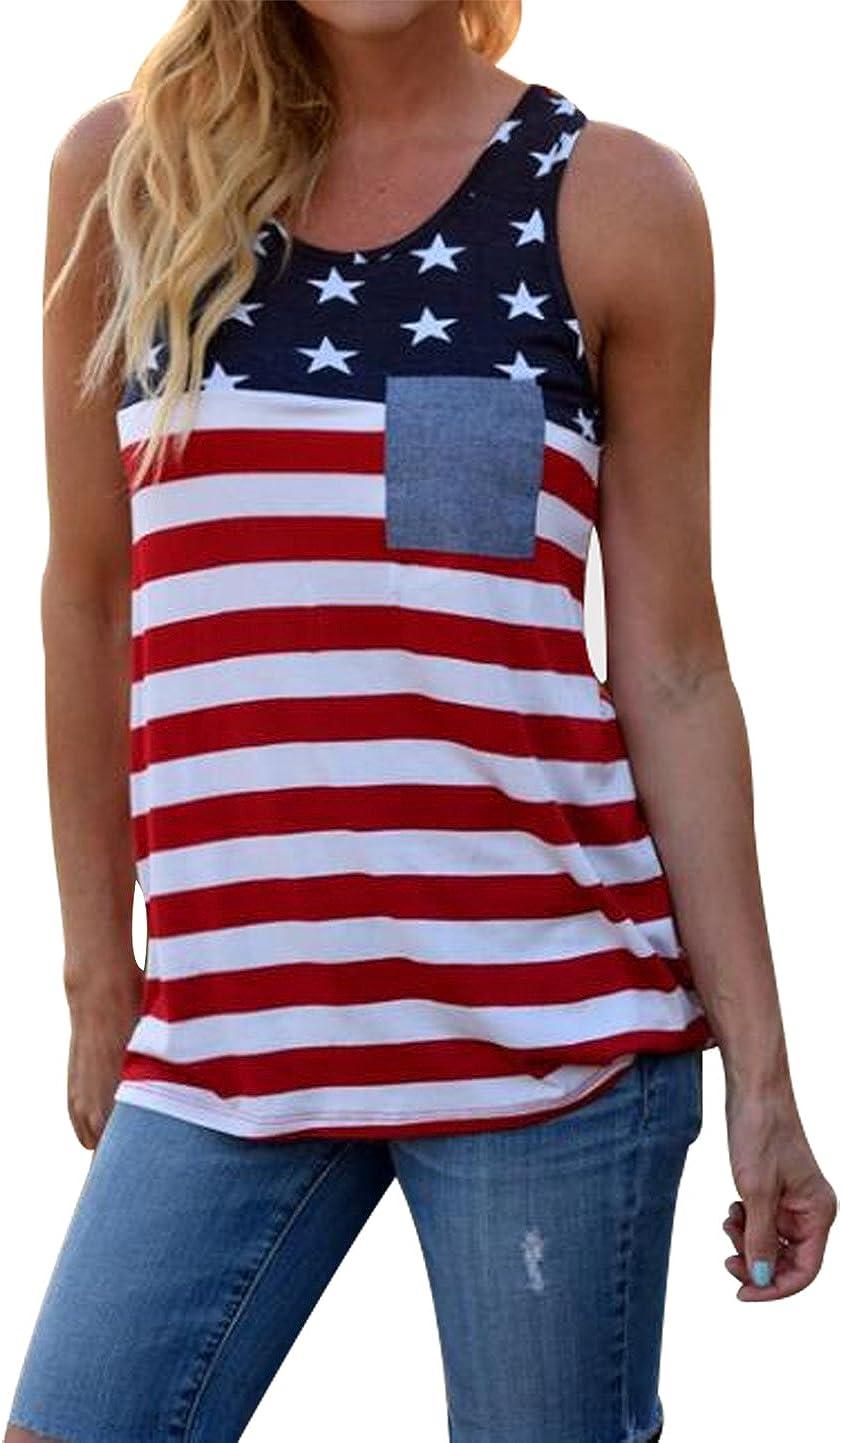 MEN/'S USA FLAG RACER BACK TANK TOP STARS STRIPES SLEEVELESS PATRIOTIC T-SHIRT